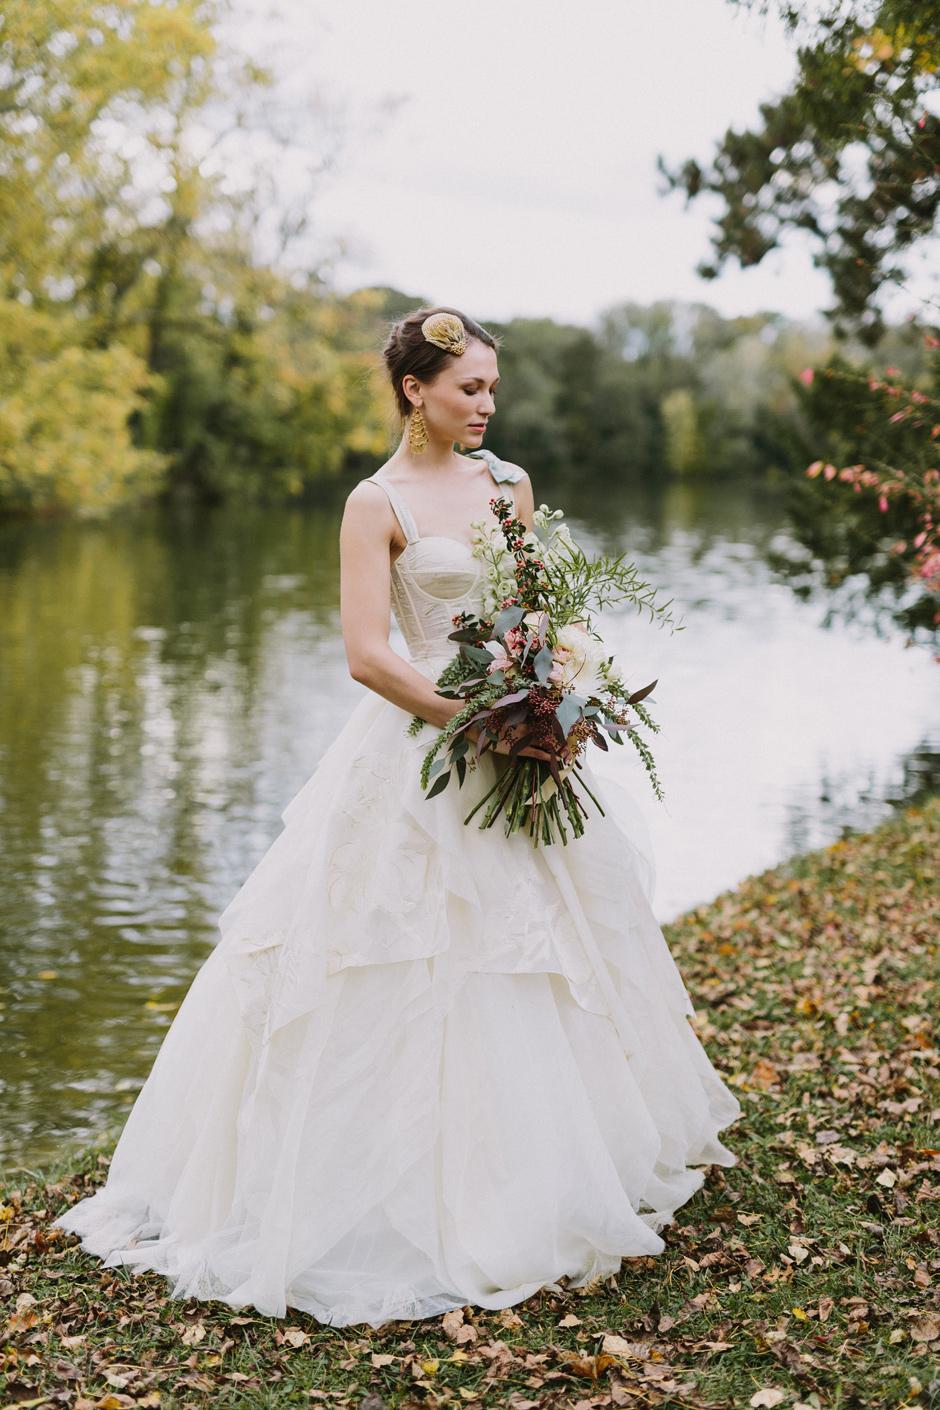 laxenburg-wedding-photographer-073